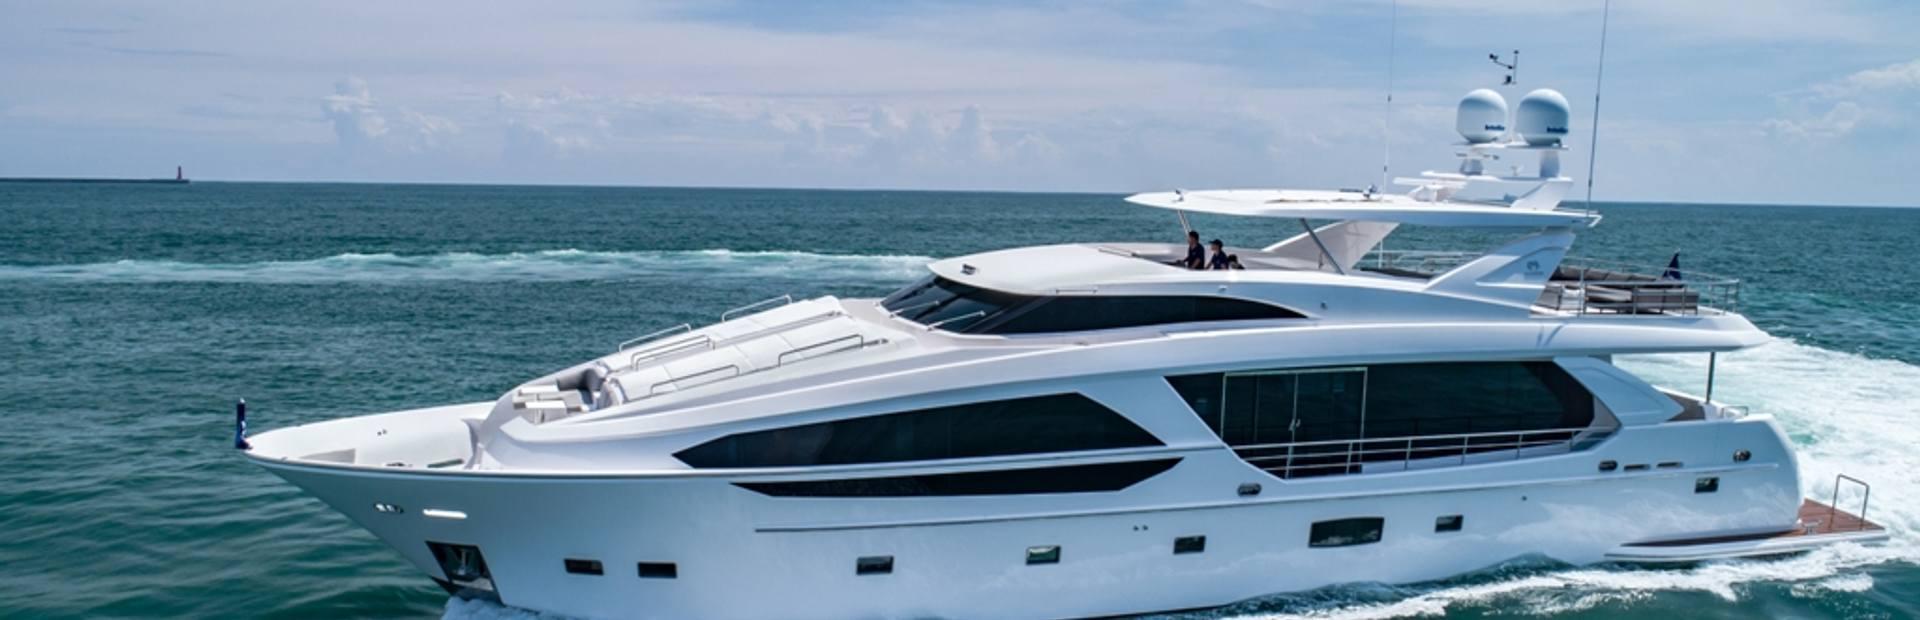 CC115 Yacht Charter